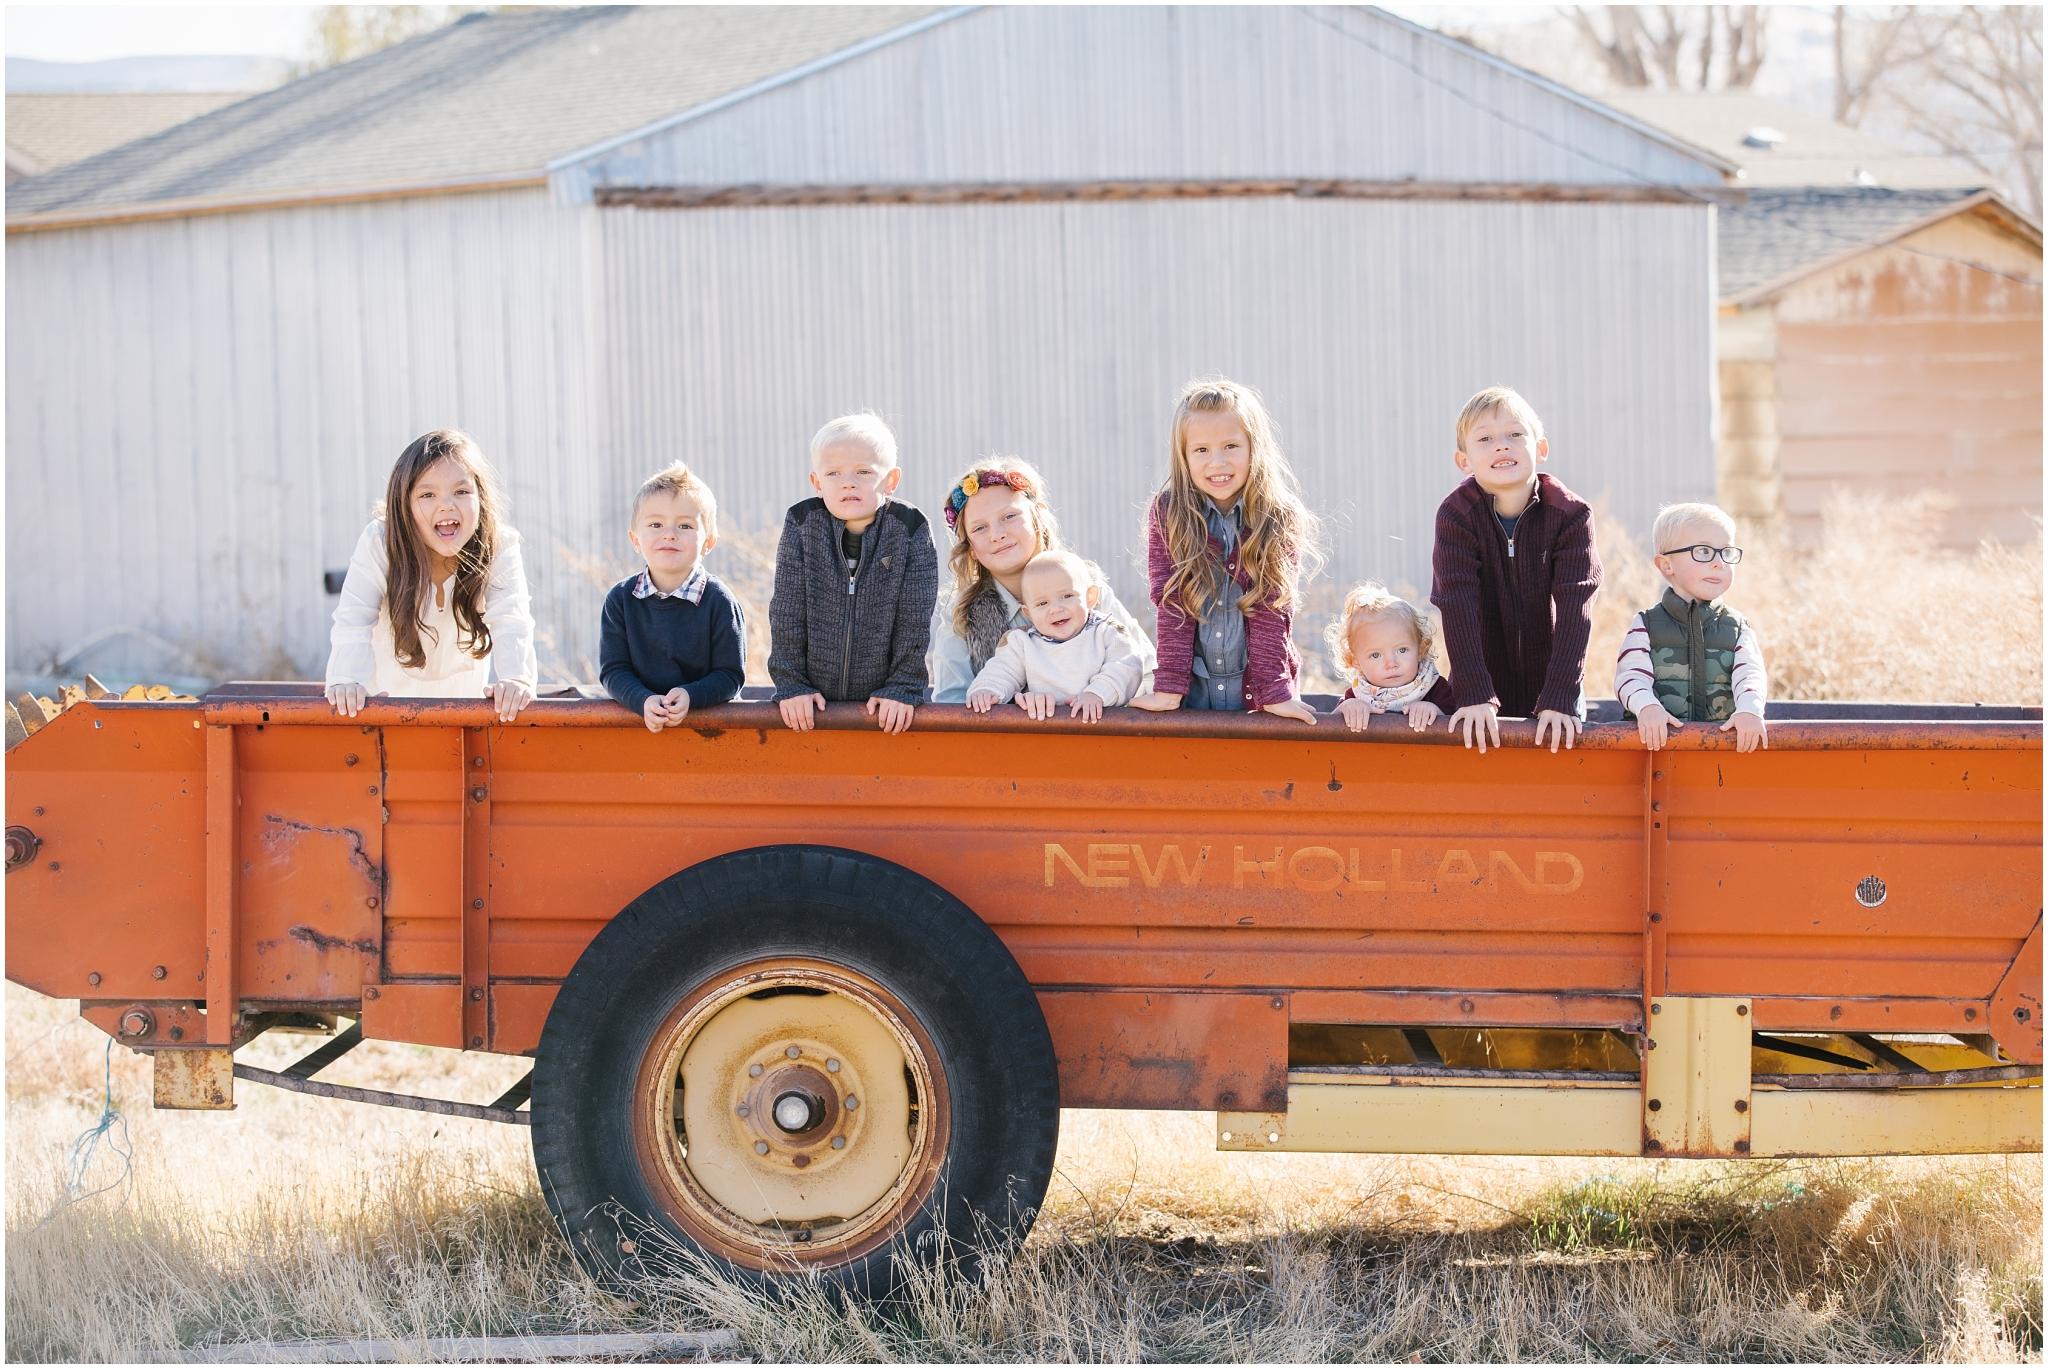 Laws-94_Lizzie-B-Imagery-Utah-Family-Photographer-Salt-Lake-City-Park-City-Davis-County-Clearfield.jpg